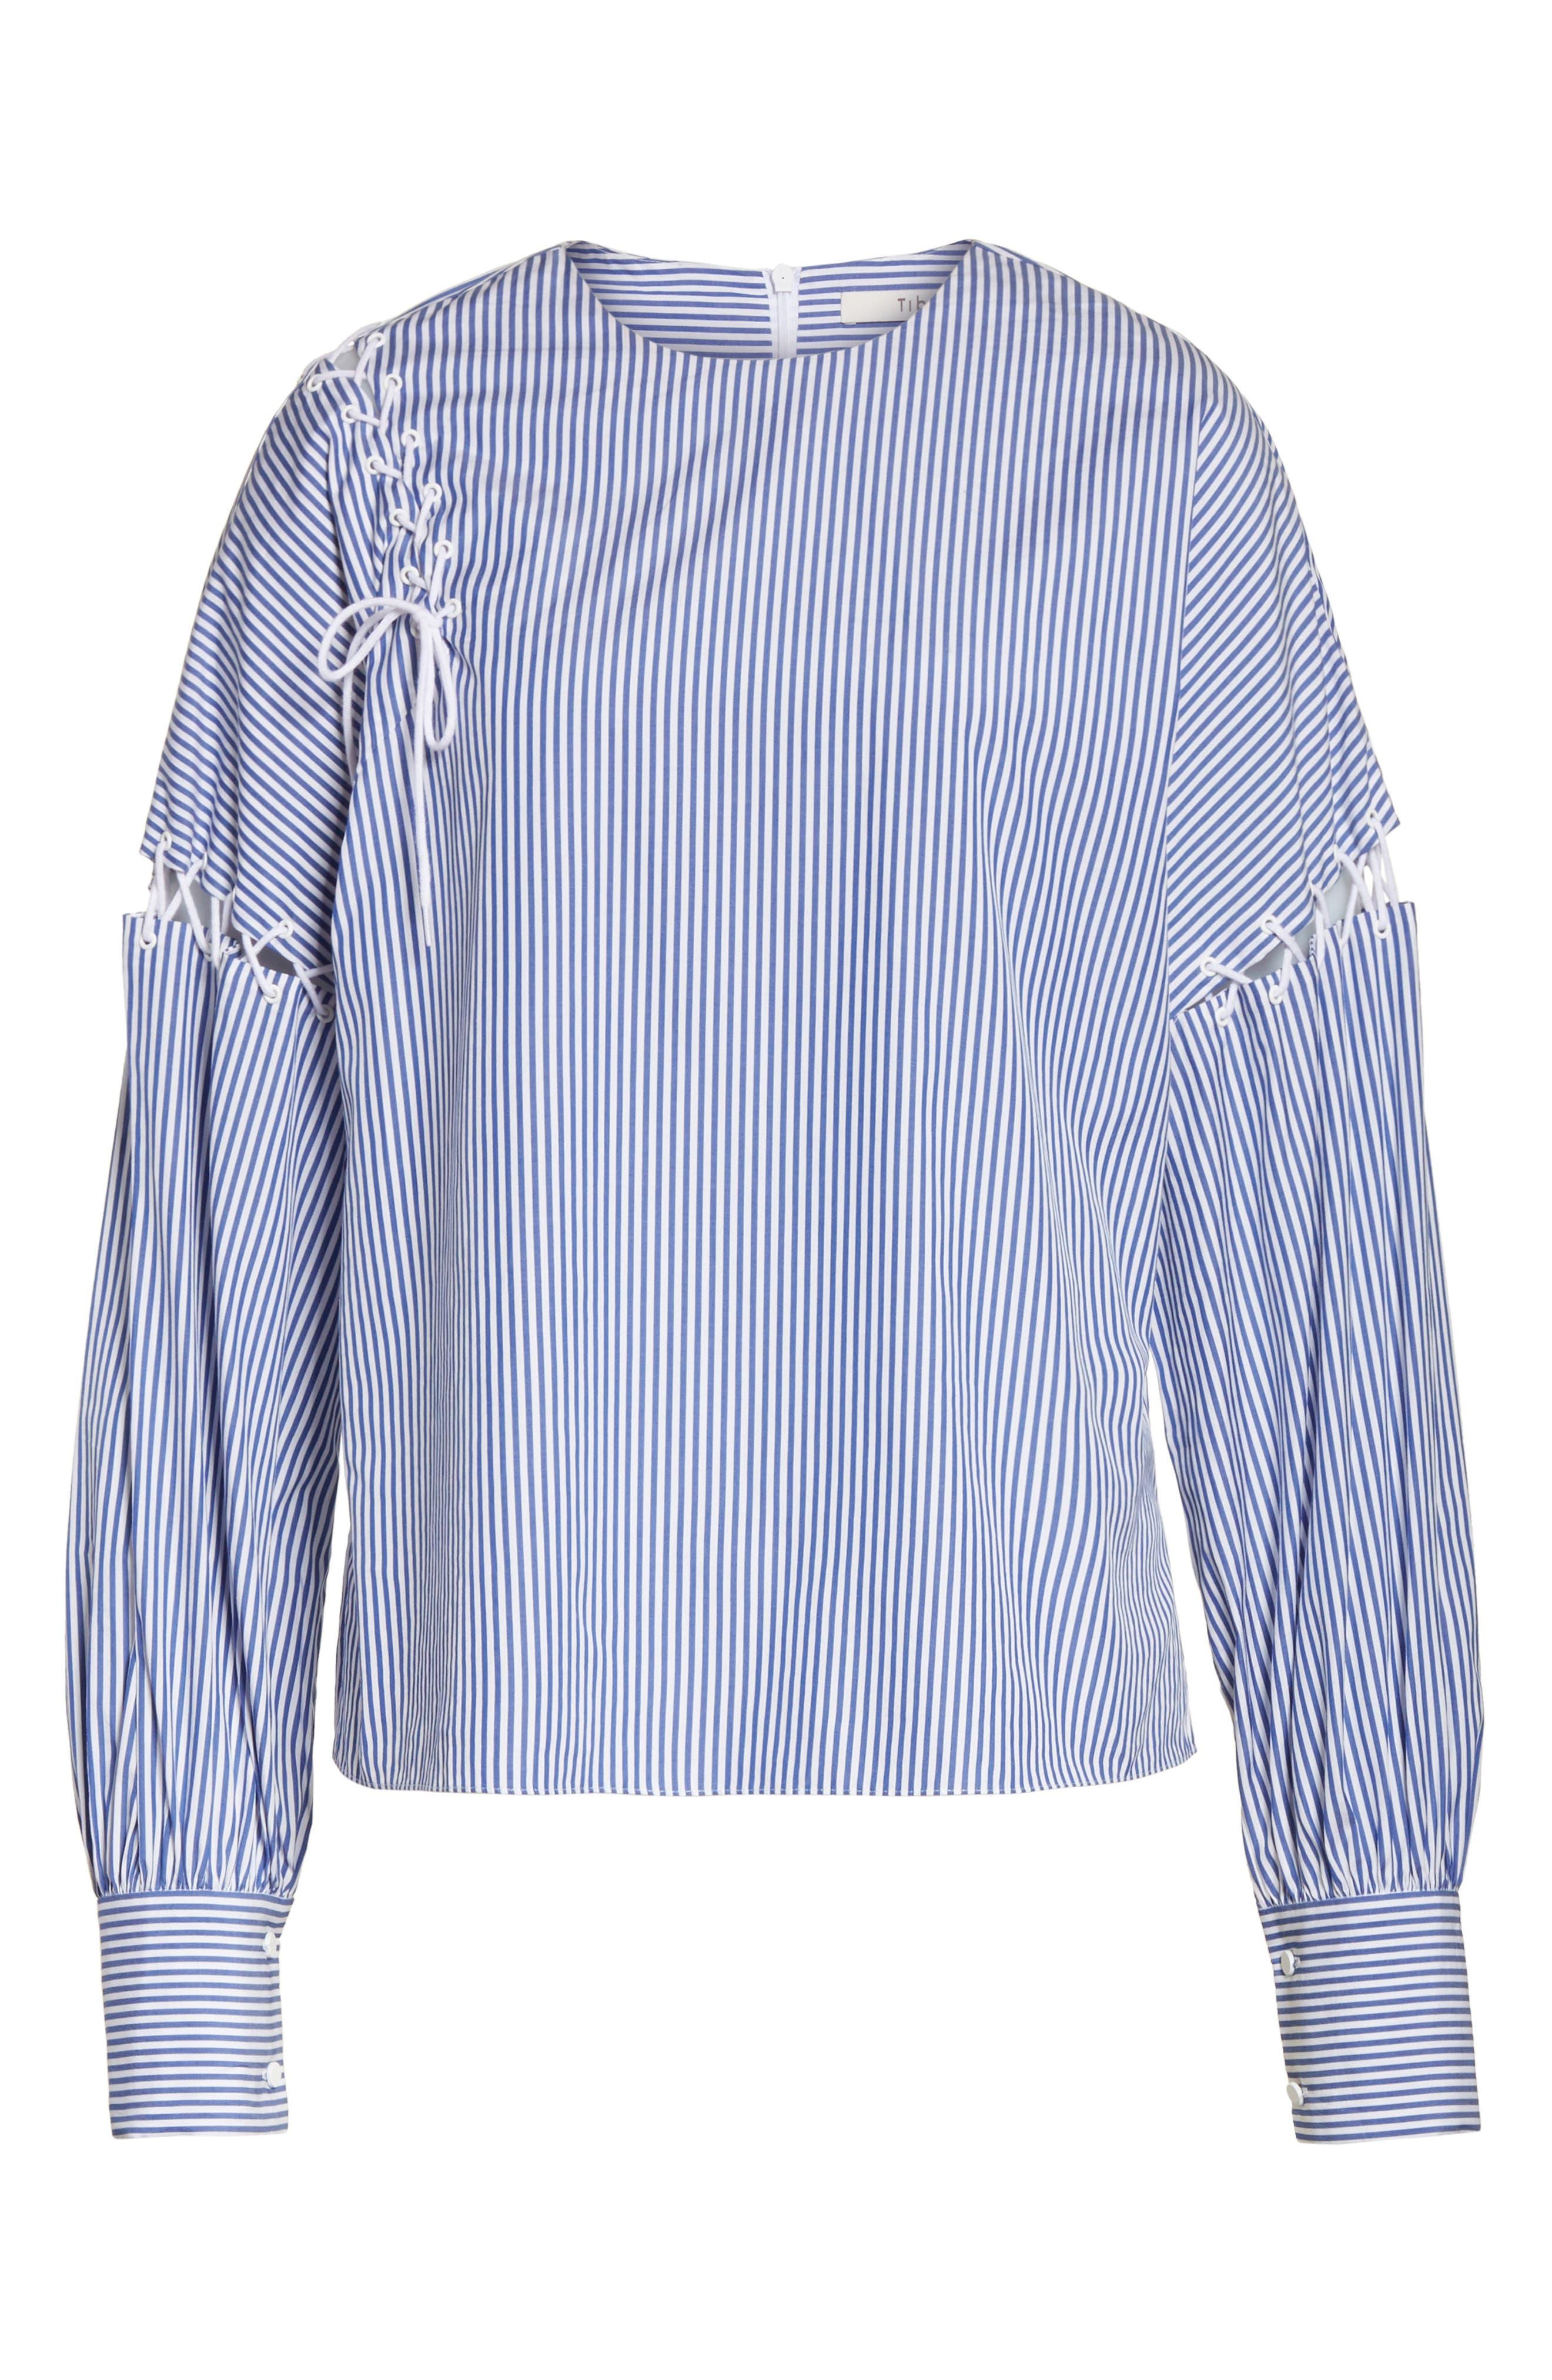 Shirting Stripe Top,                             Alternate thumbnail 6, color,